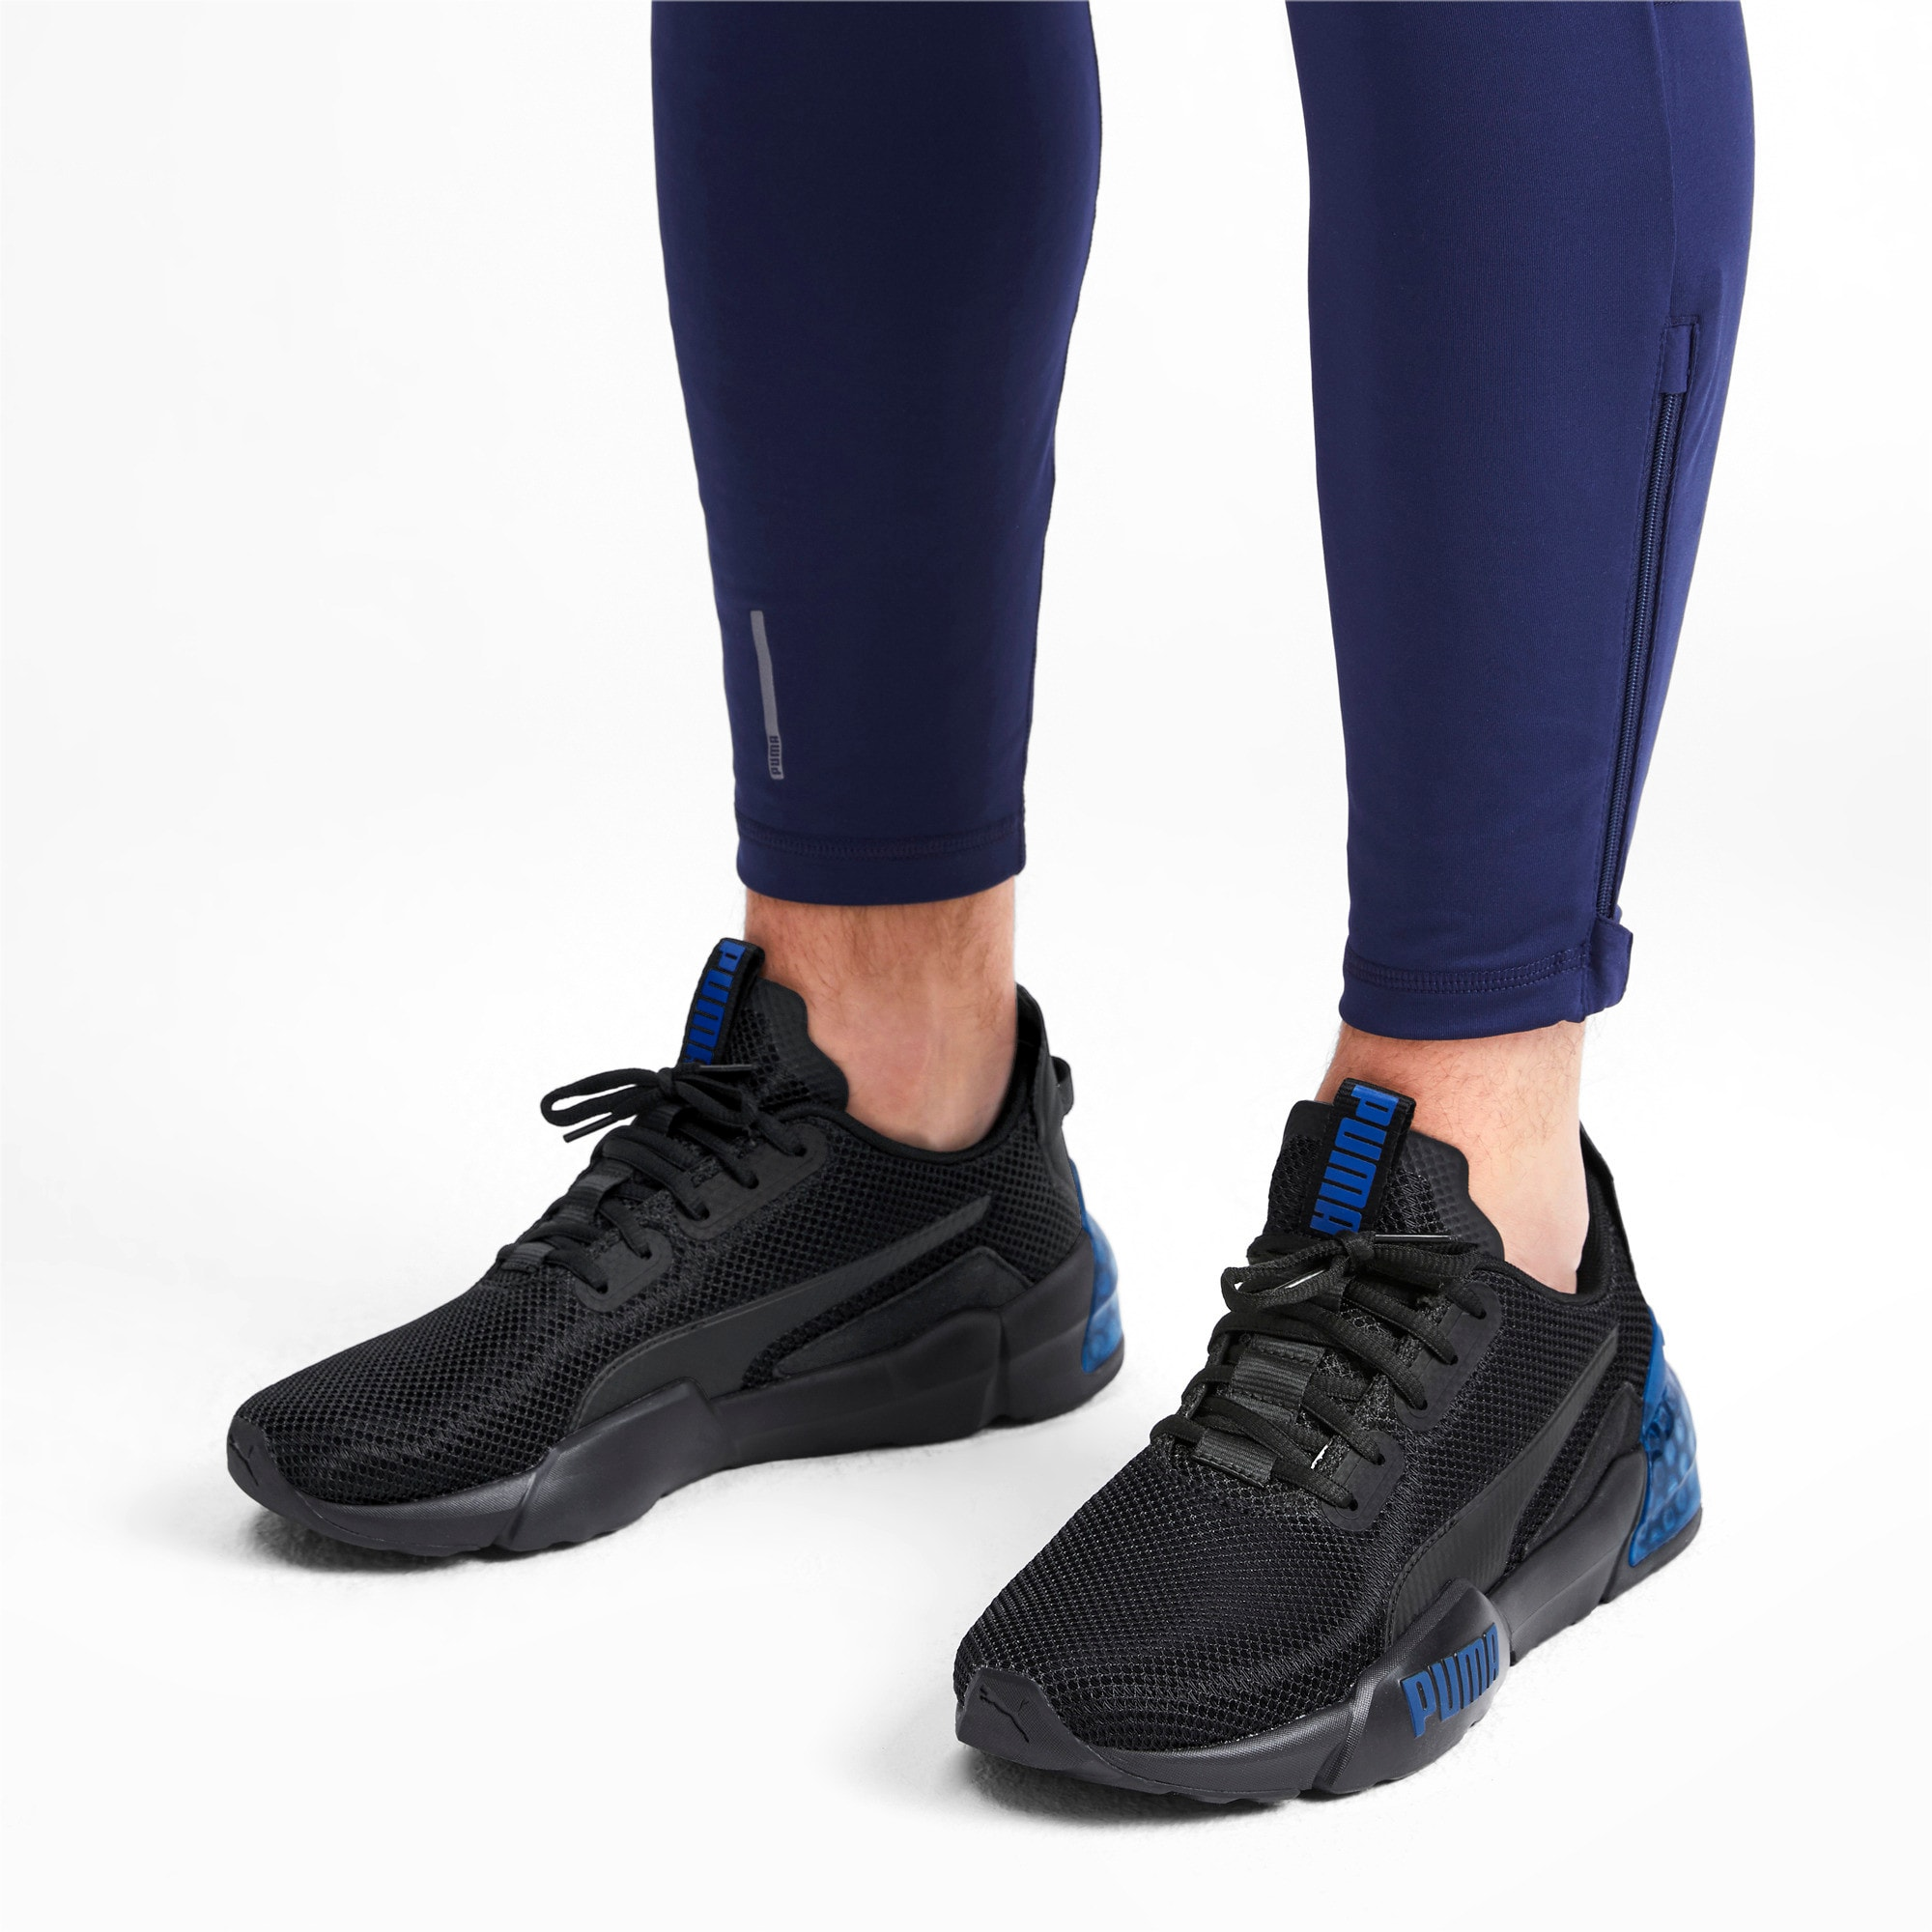 Thumbnail 2 of CELL Phase Men's Training Shoes, Puma Black-Galaxy Blue, medium